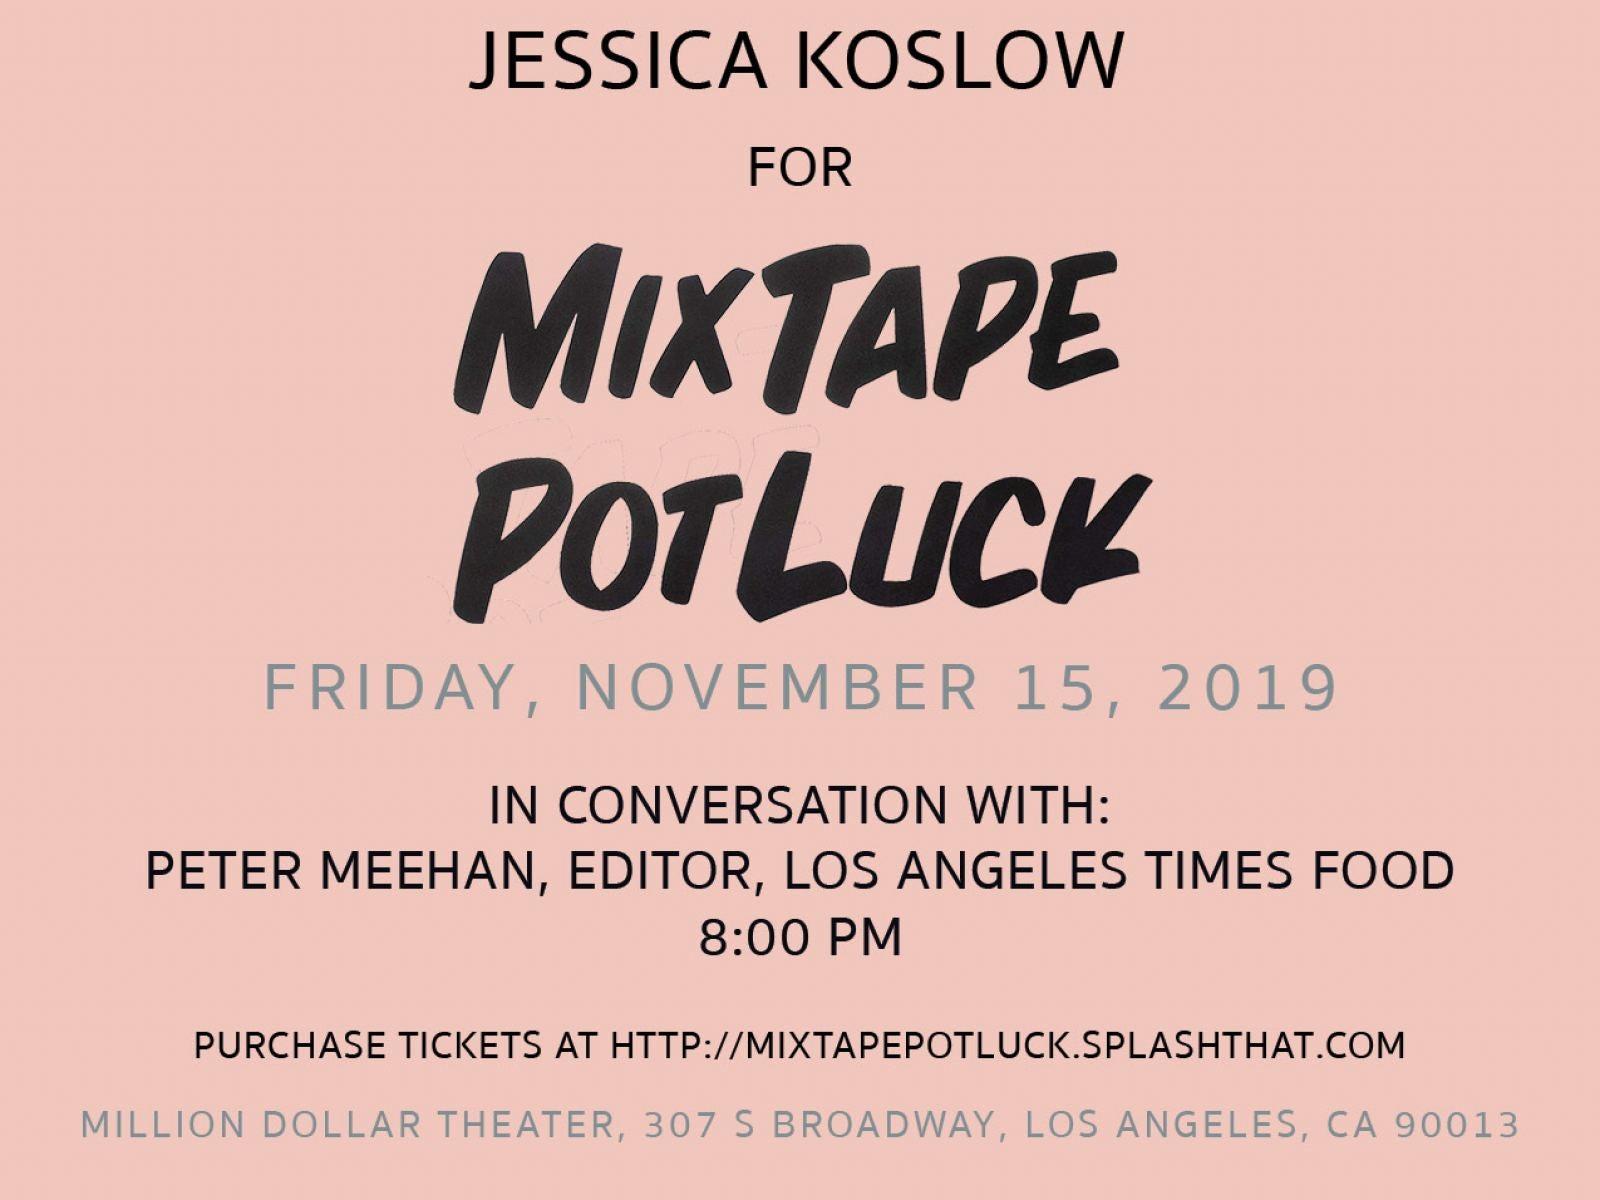 Mixtape Potluck Cookbook Flyer